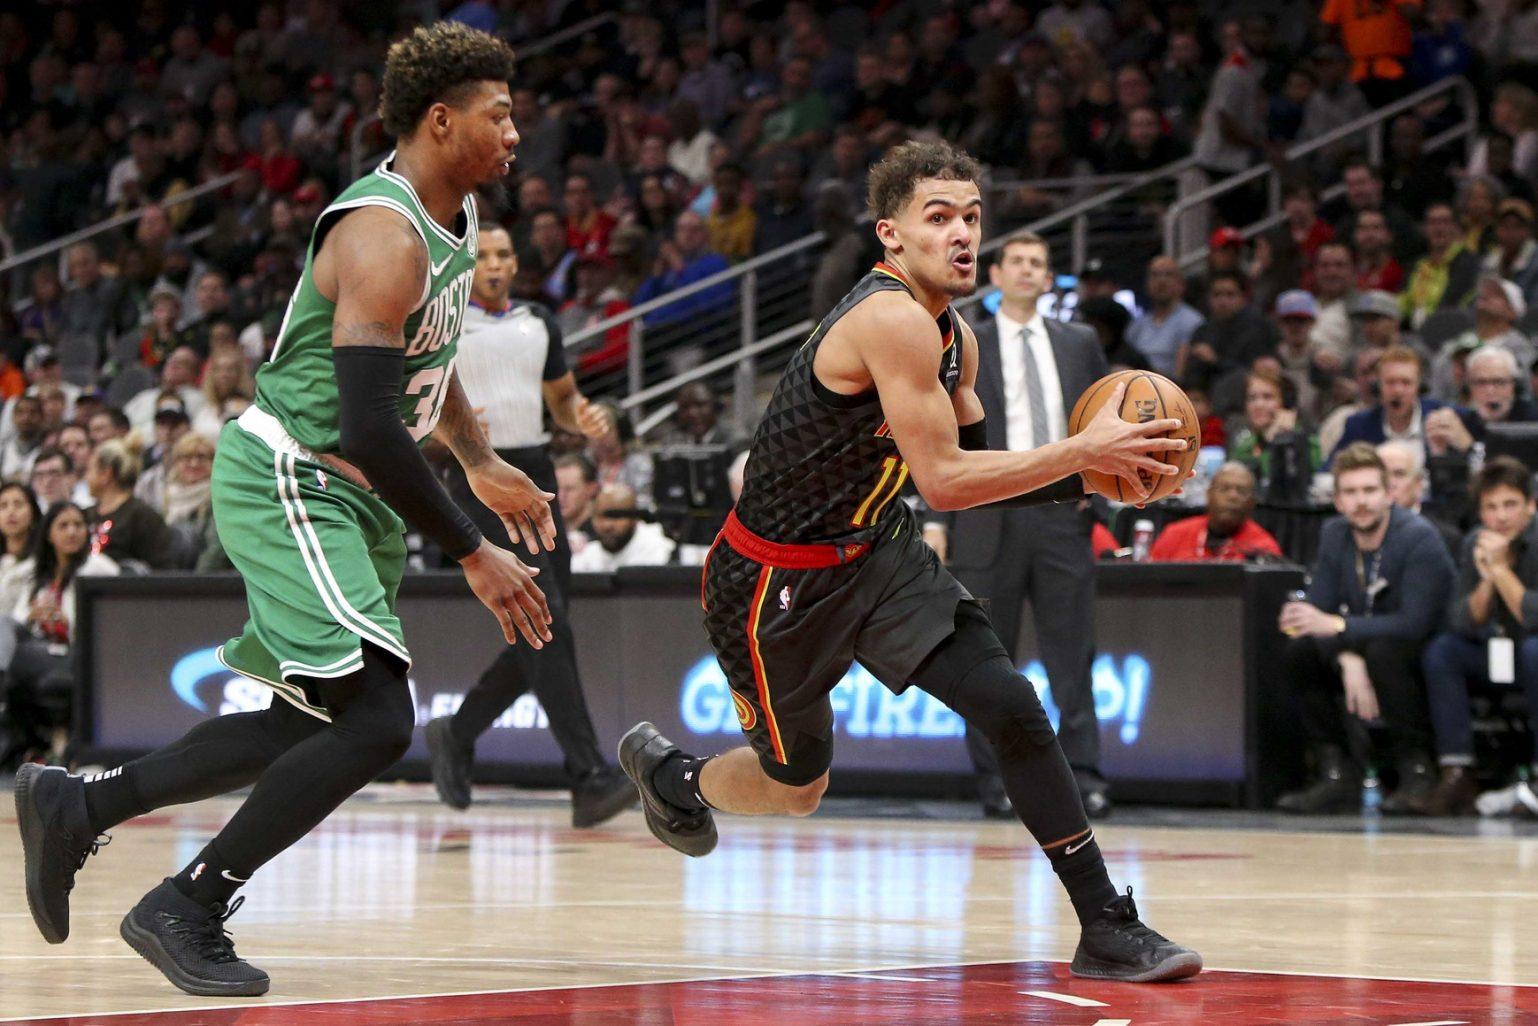 Recap: Celtics overcome first-half beak attack, bring out clutch birdshot to kill Hawks